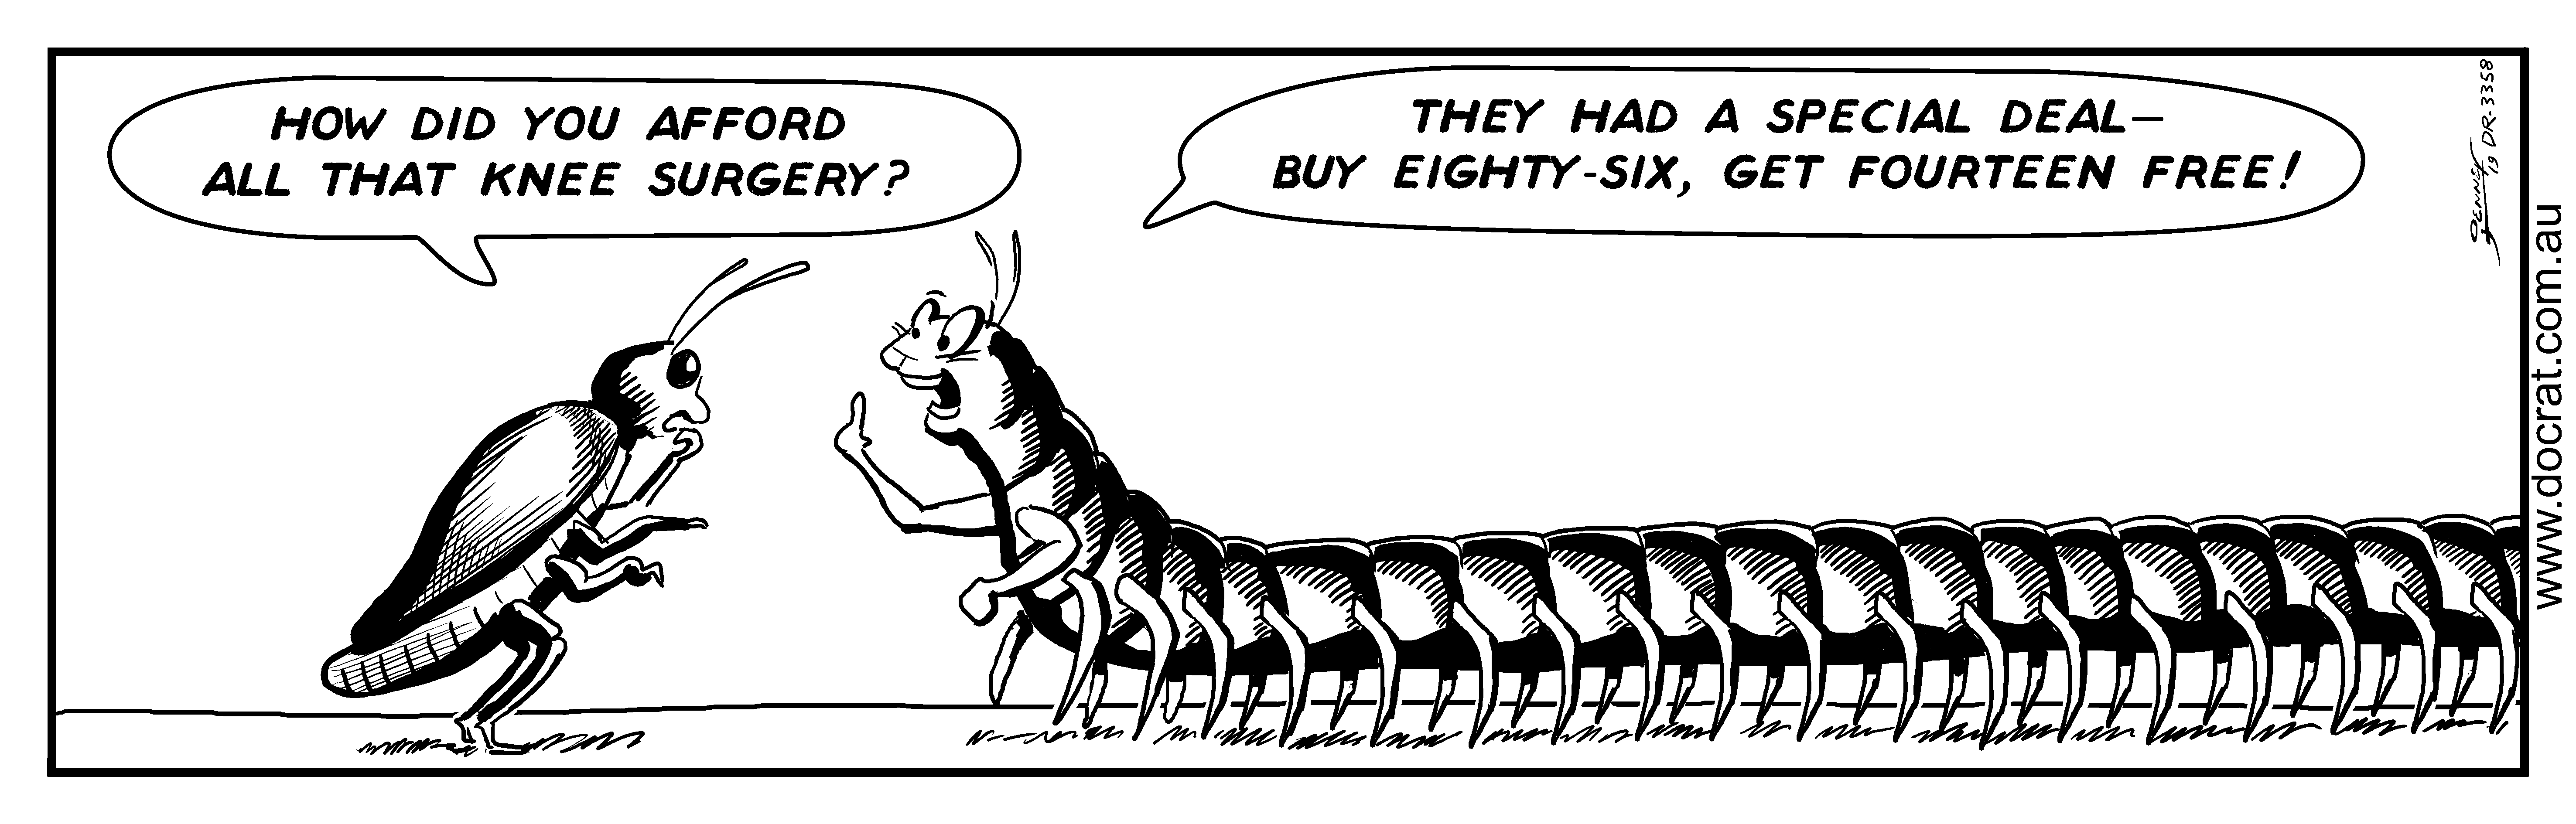 20191106